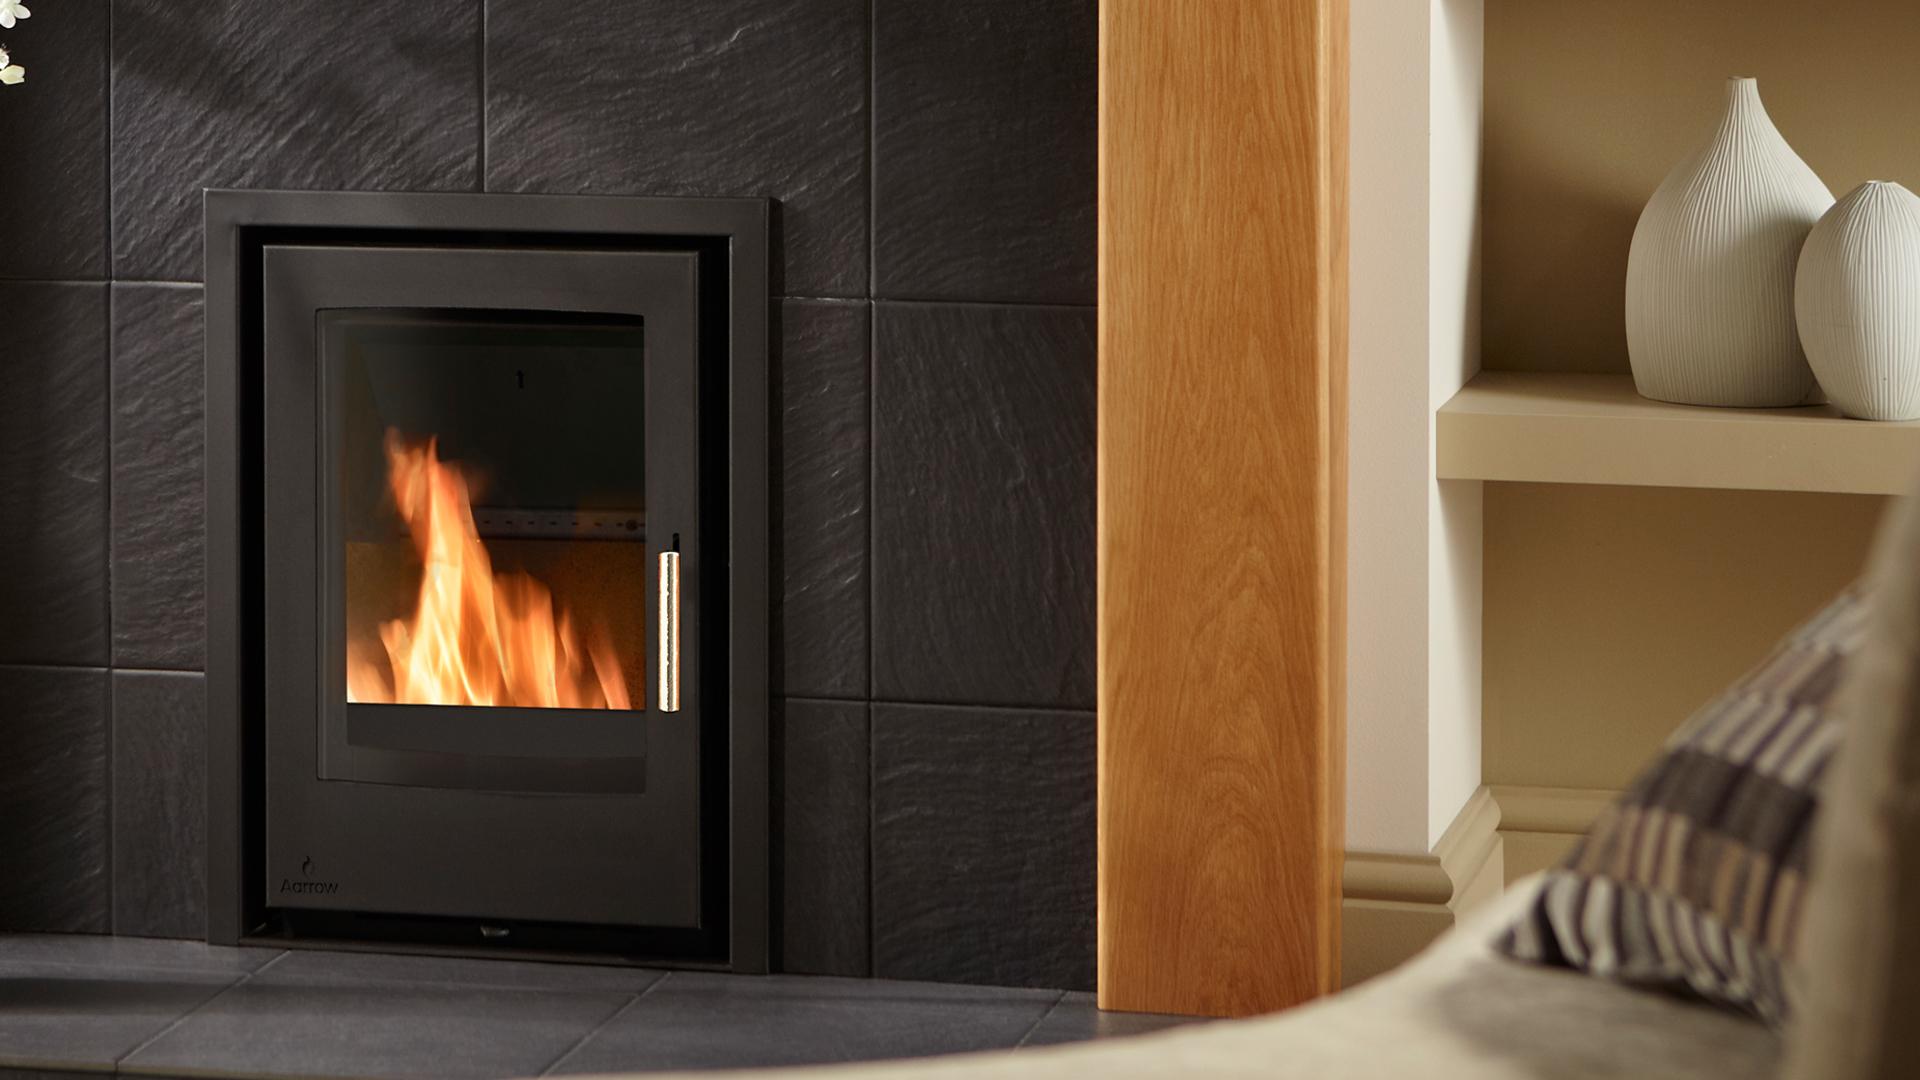 Wood Burning Stoves Multifuel Stoves Cast Iron & Gas Stoves Flue